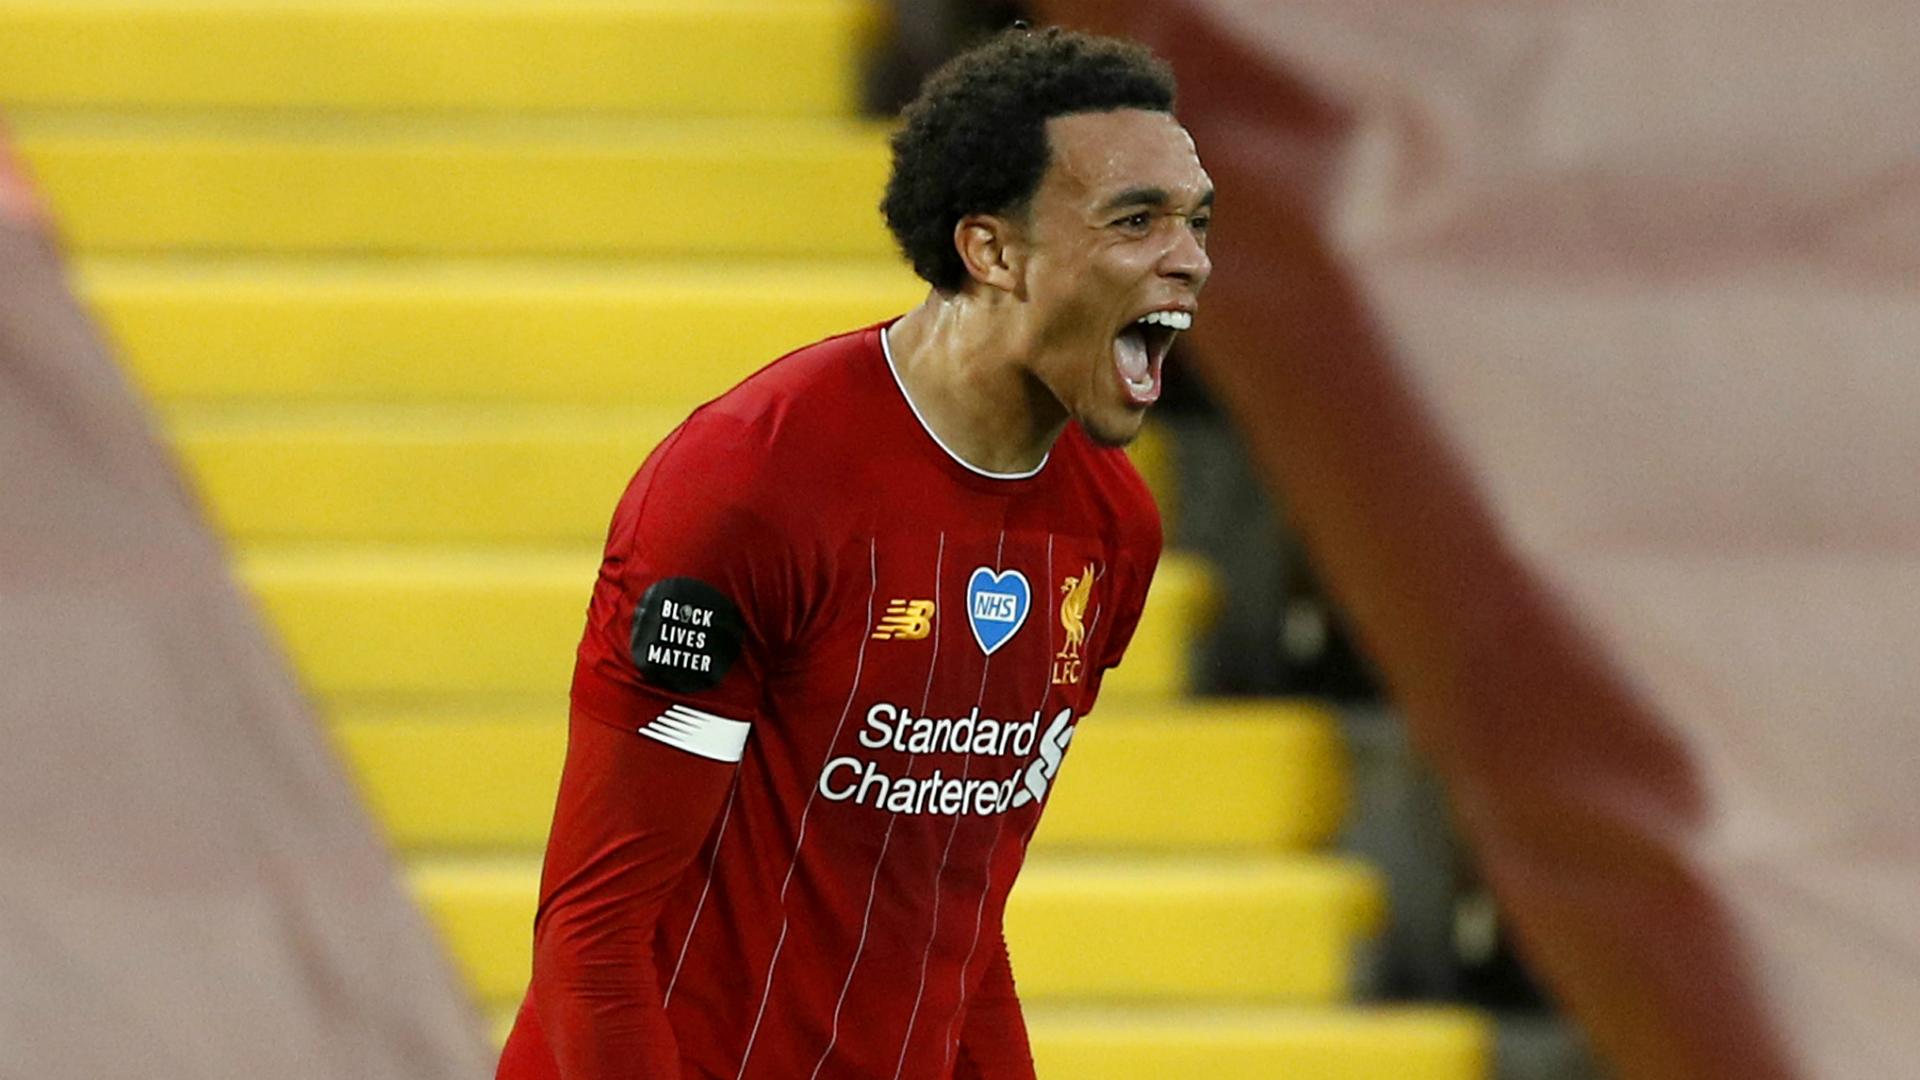 Alexander-Arnold beats Man Utd trio to Young Player of the Season award